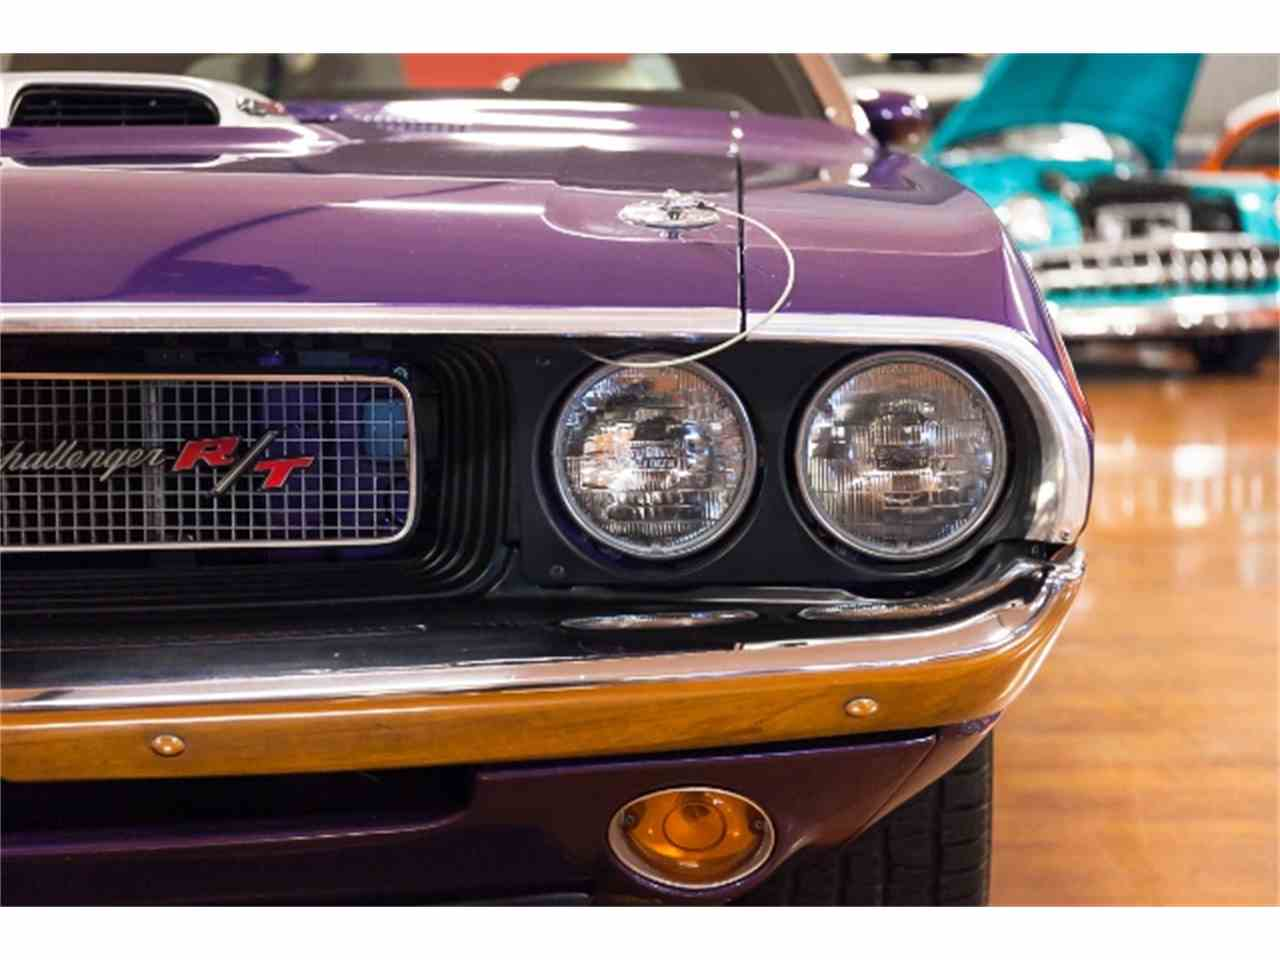 1970 Dodge Challenger For Sale Classiccars Com Cc 1045342